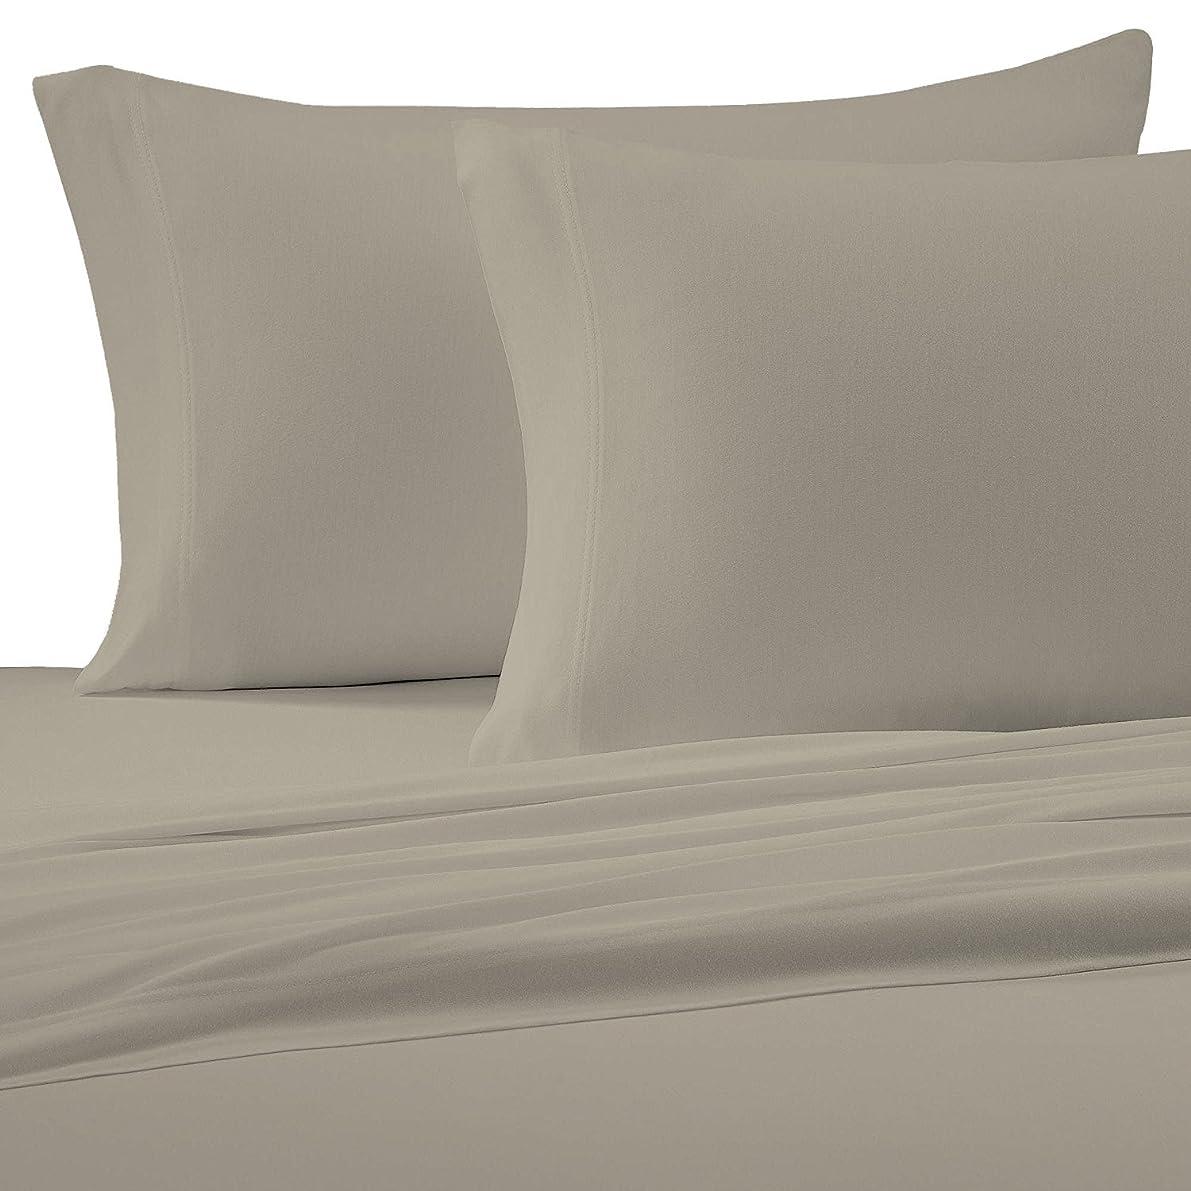 Brielle Egyptian Cotton Jersey, Standard Pillow Case Set, Silver Sand